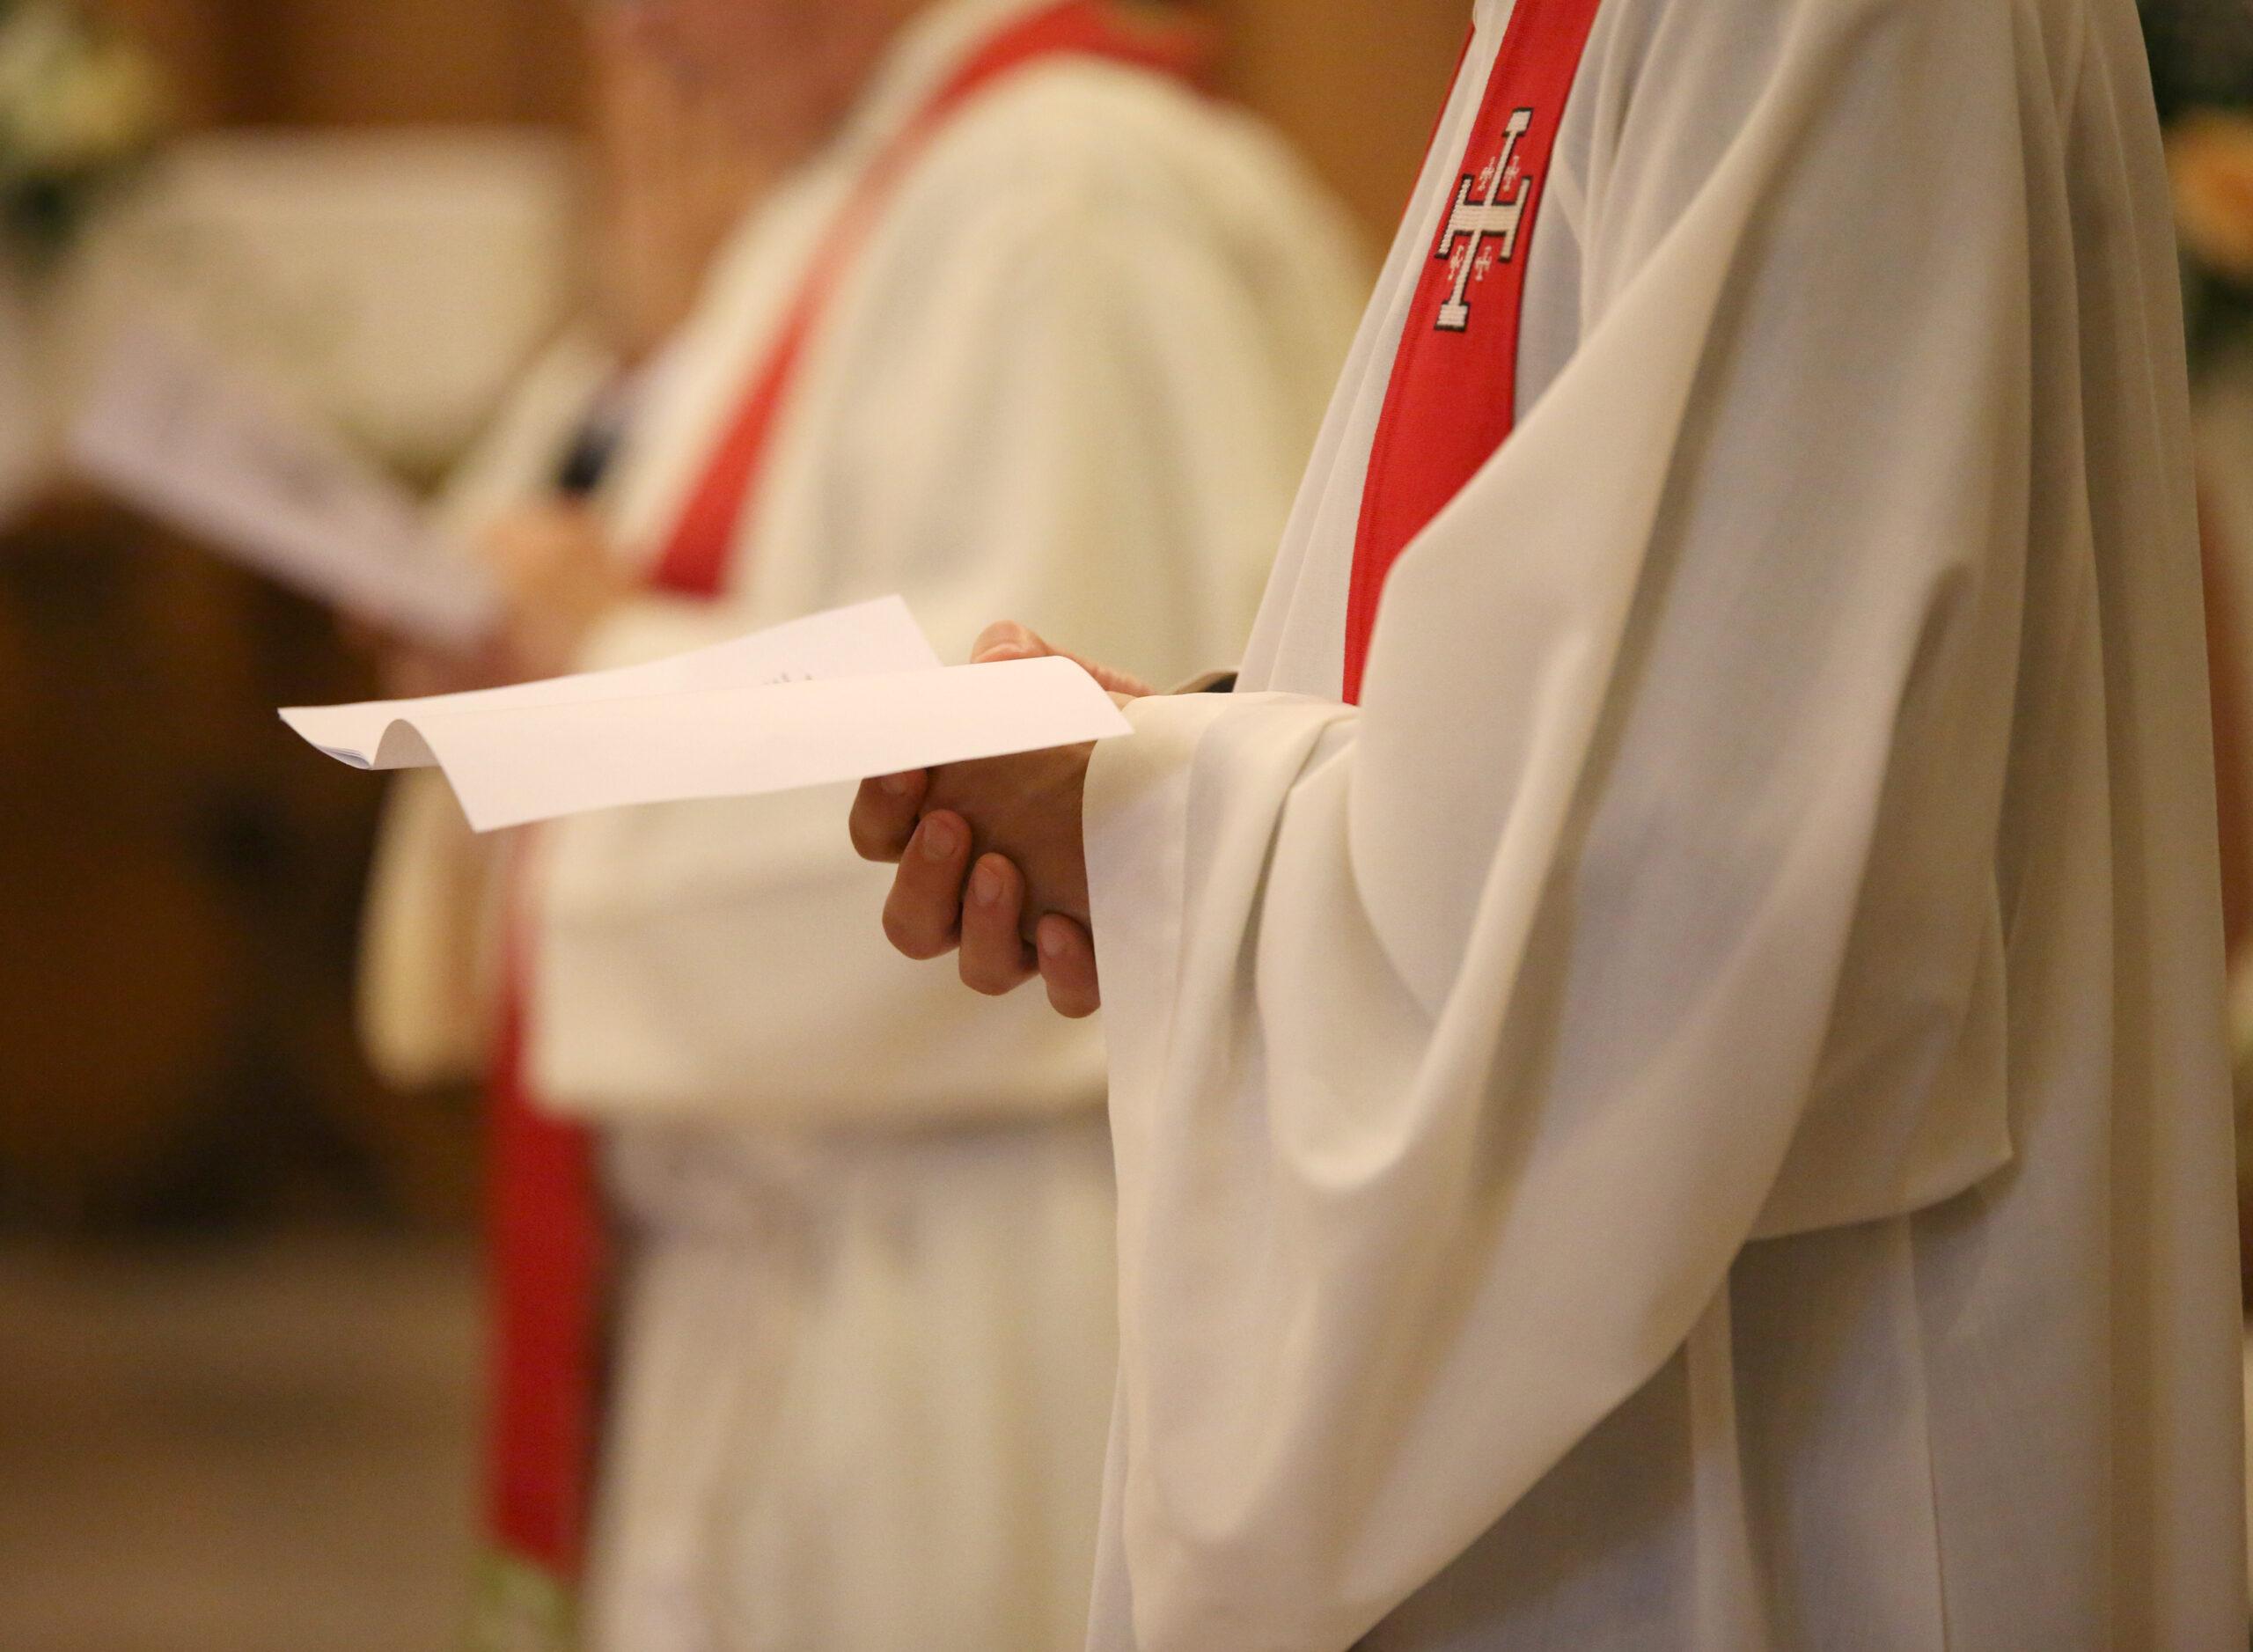 US Bishops on Laudato Si': More like 'Laudato No'